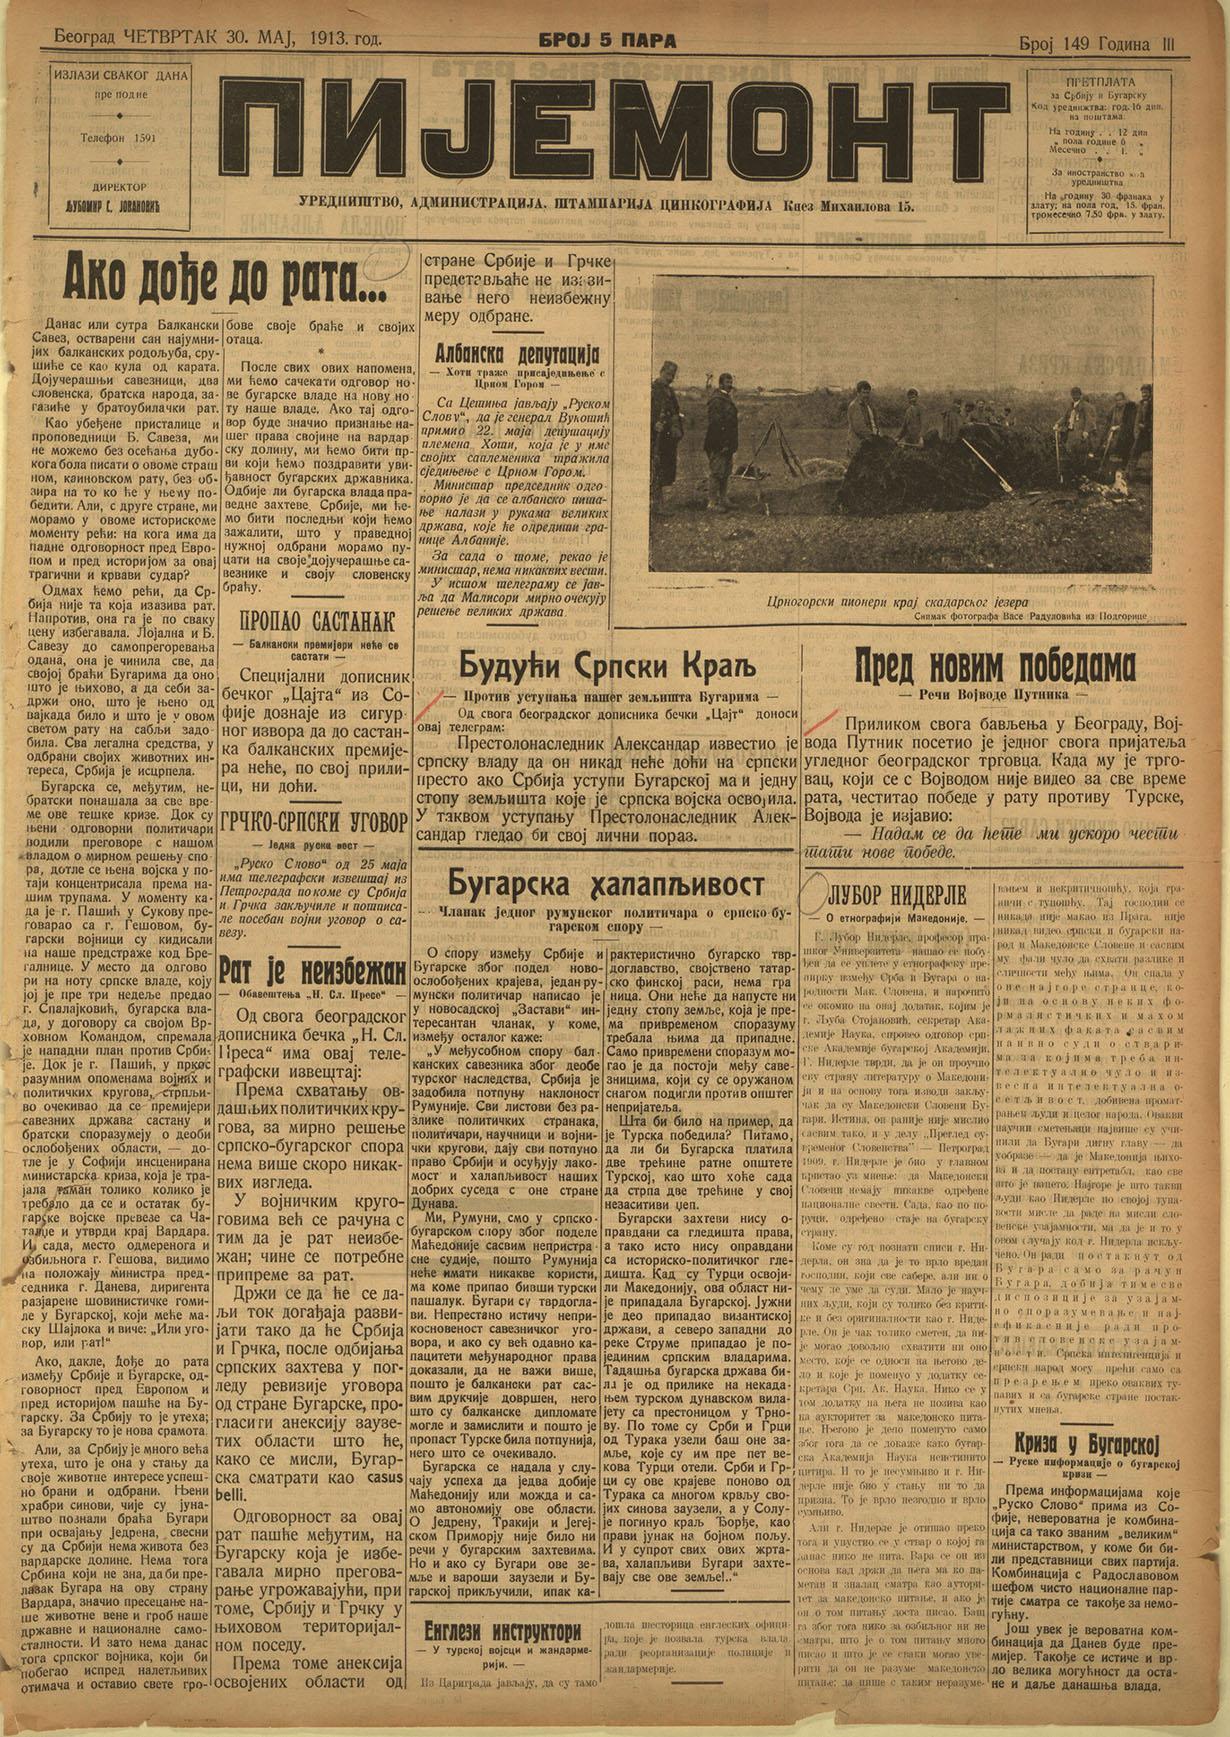 Kako su izgledale srpske novine pred izbijanje Balkanskih ratova? 2